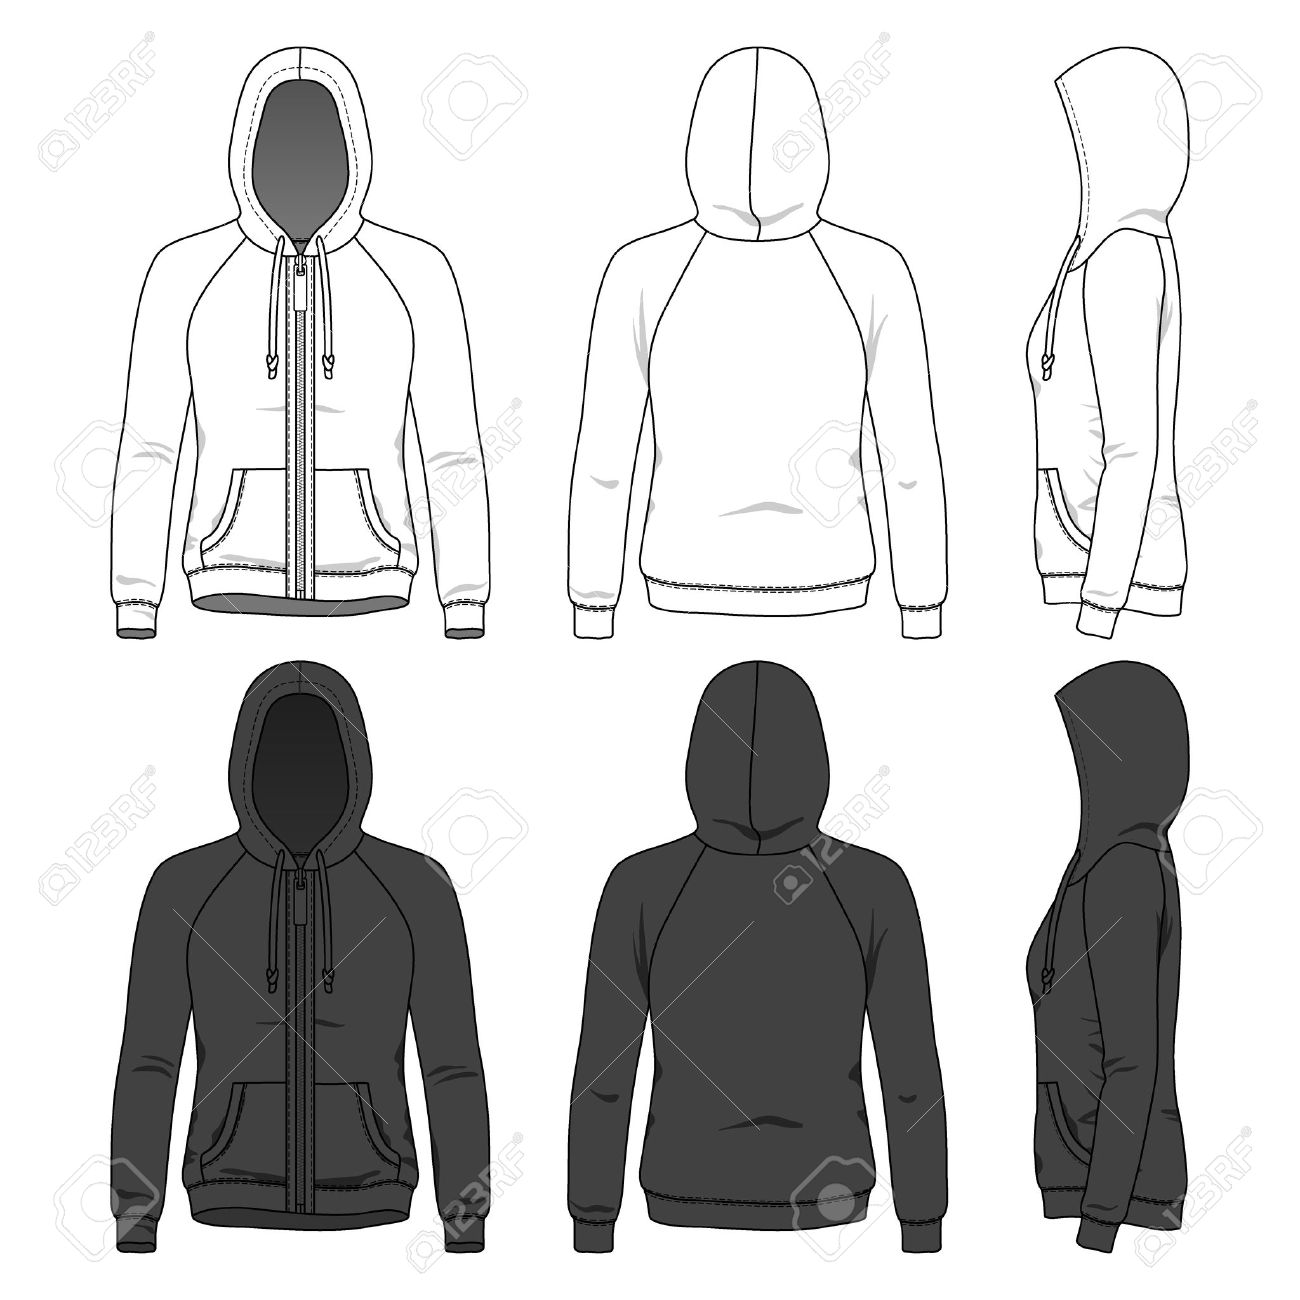 Womens hoodie with zipper and raglan sleeves in front back womens hoodie with zipper and raglan sleeves in front back and side views blank pronofoot35fo Choice Image